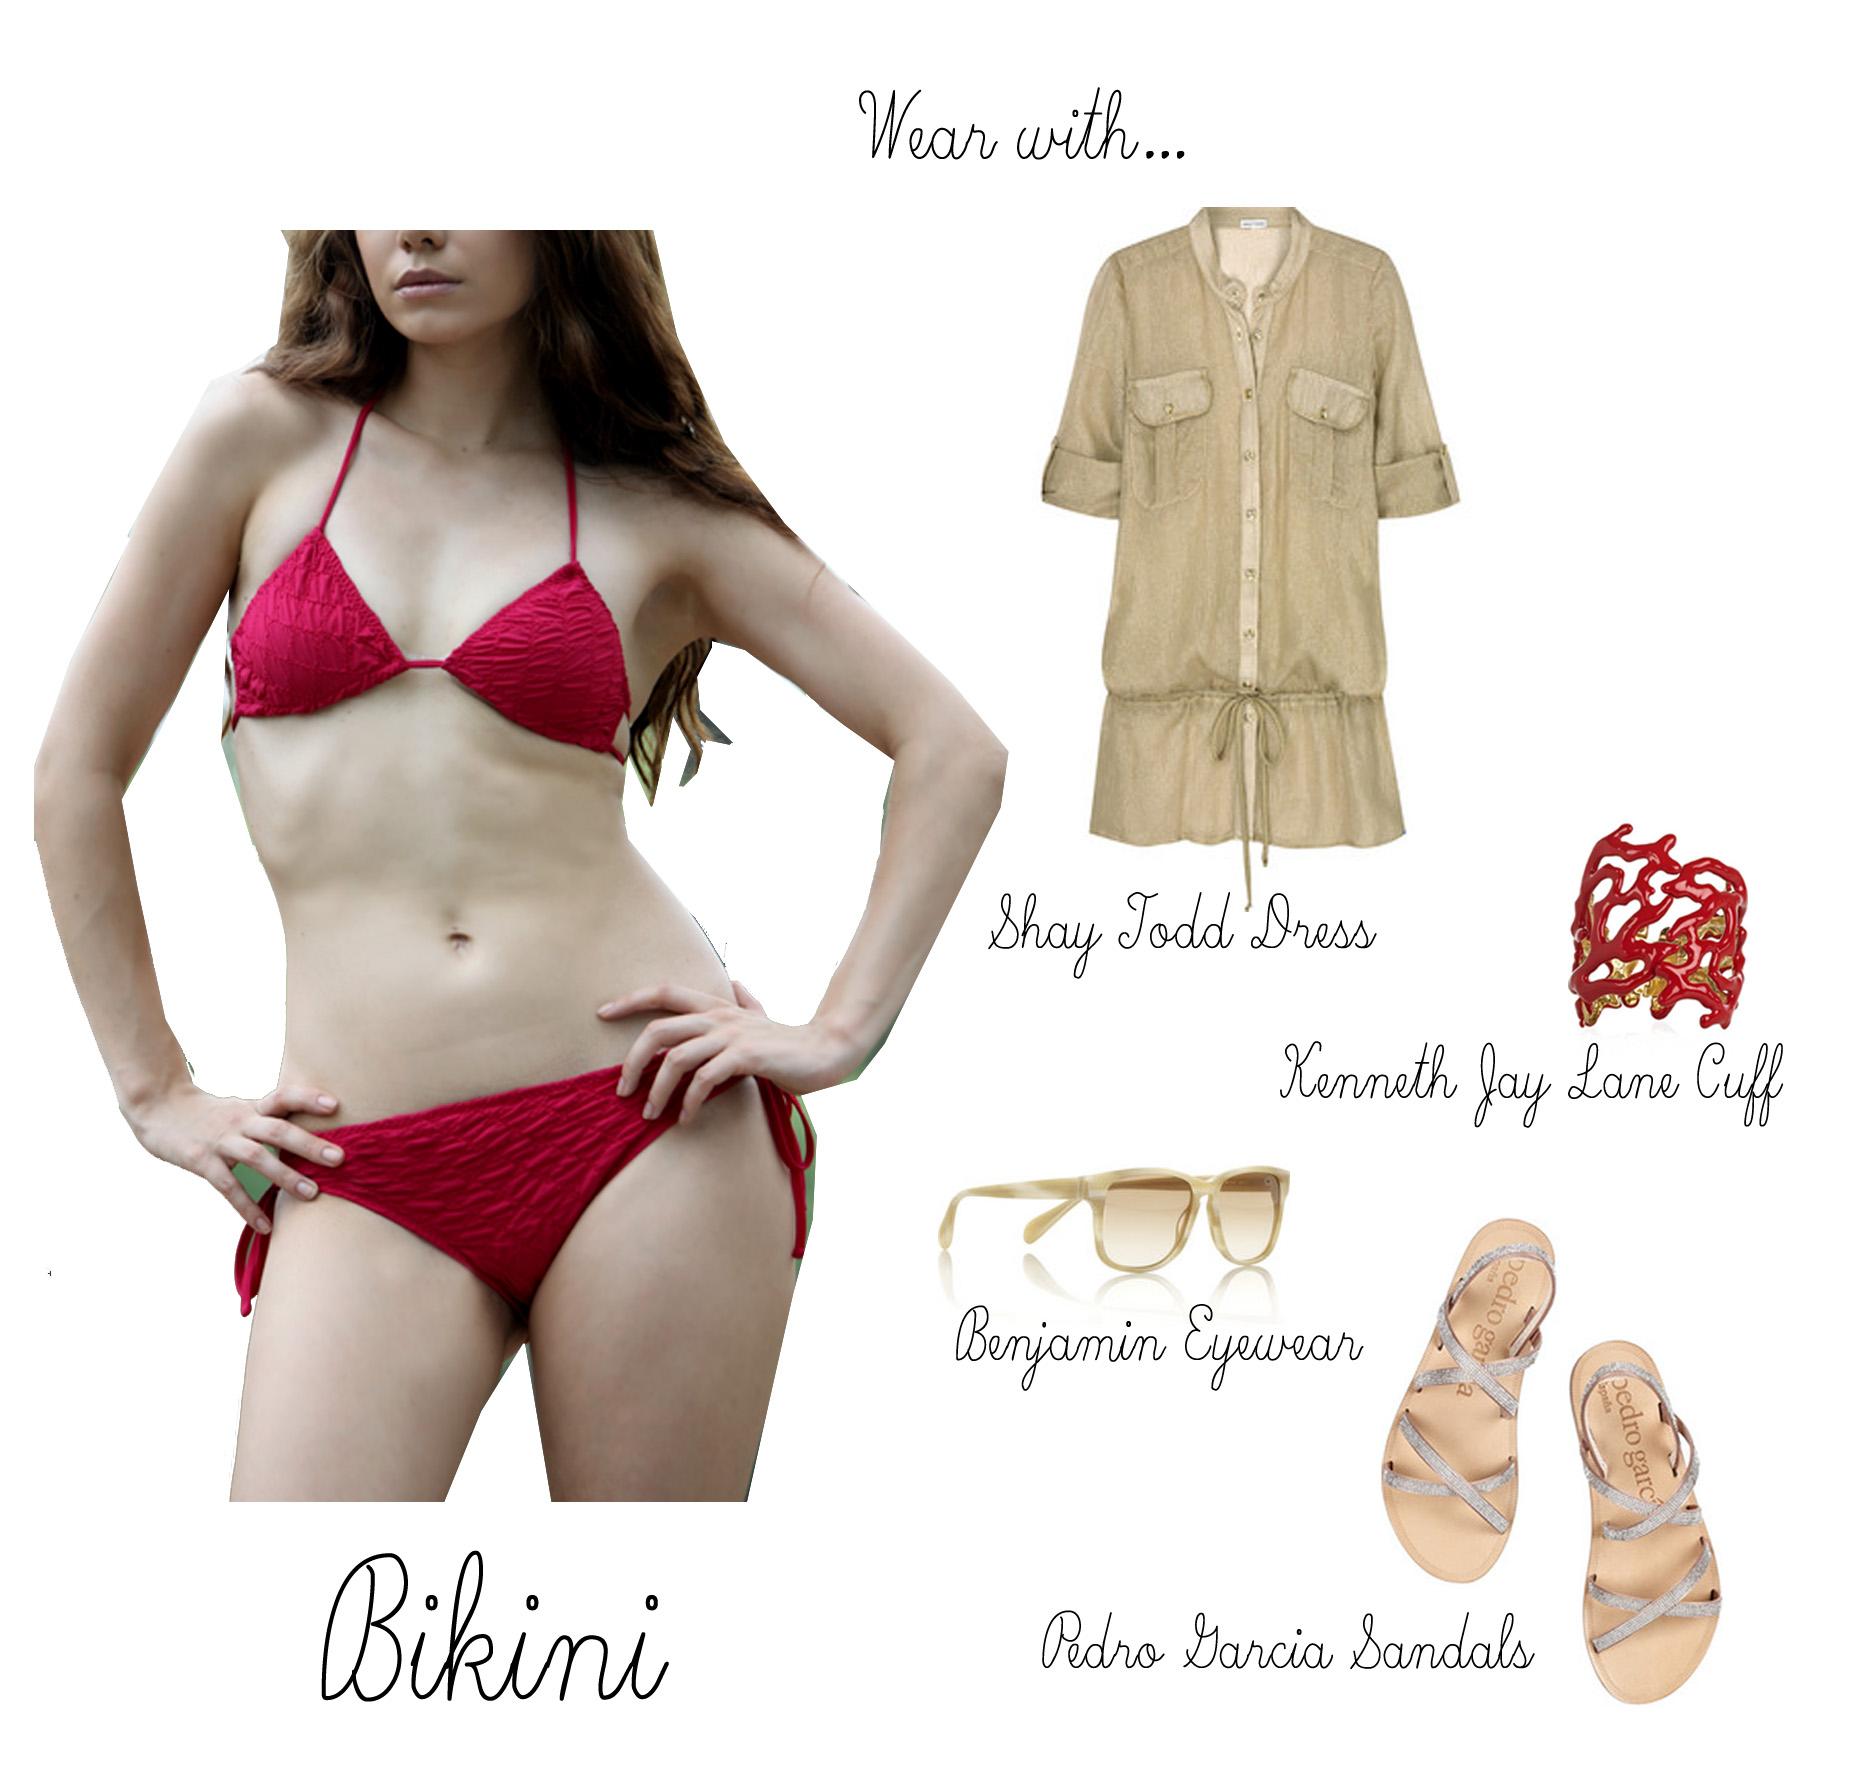 bikini beach bikini sex 3gp